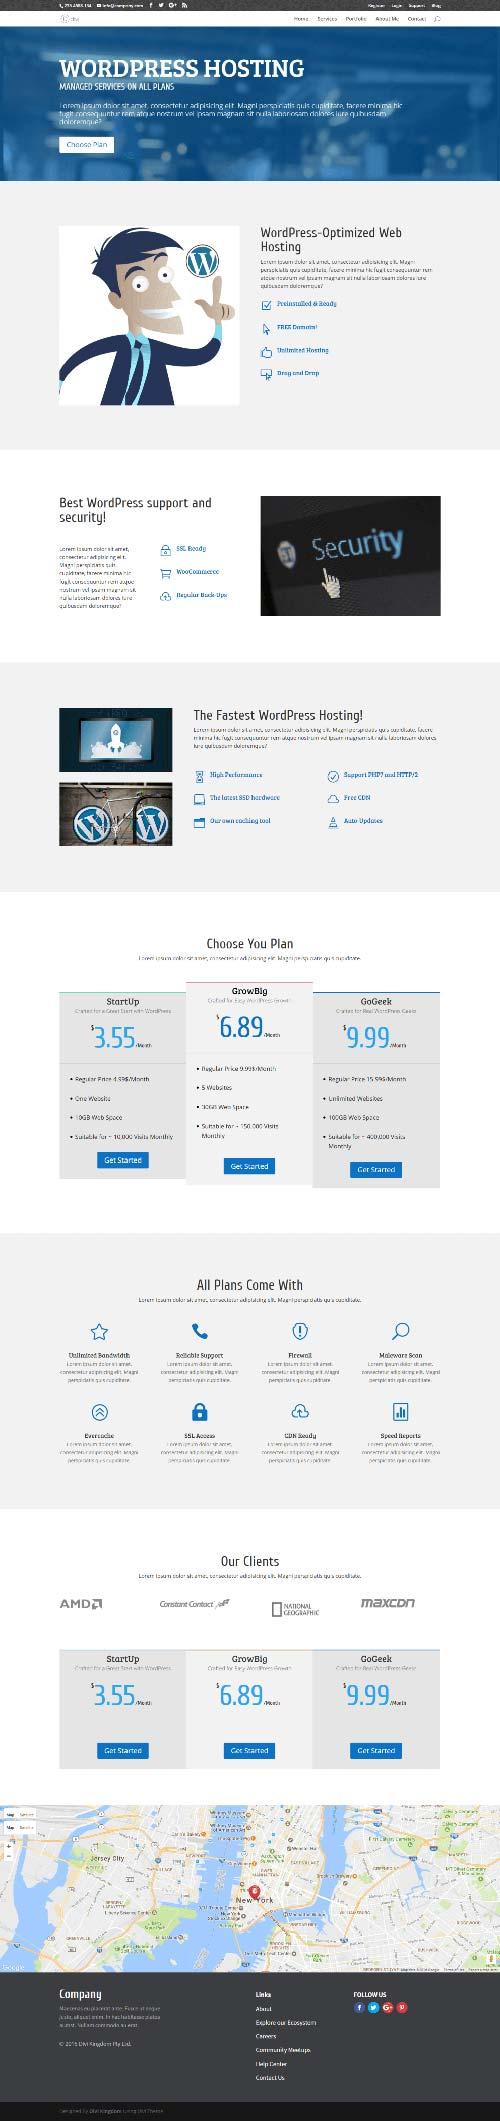 divi layout for hosting business